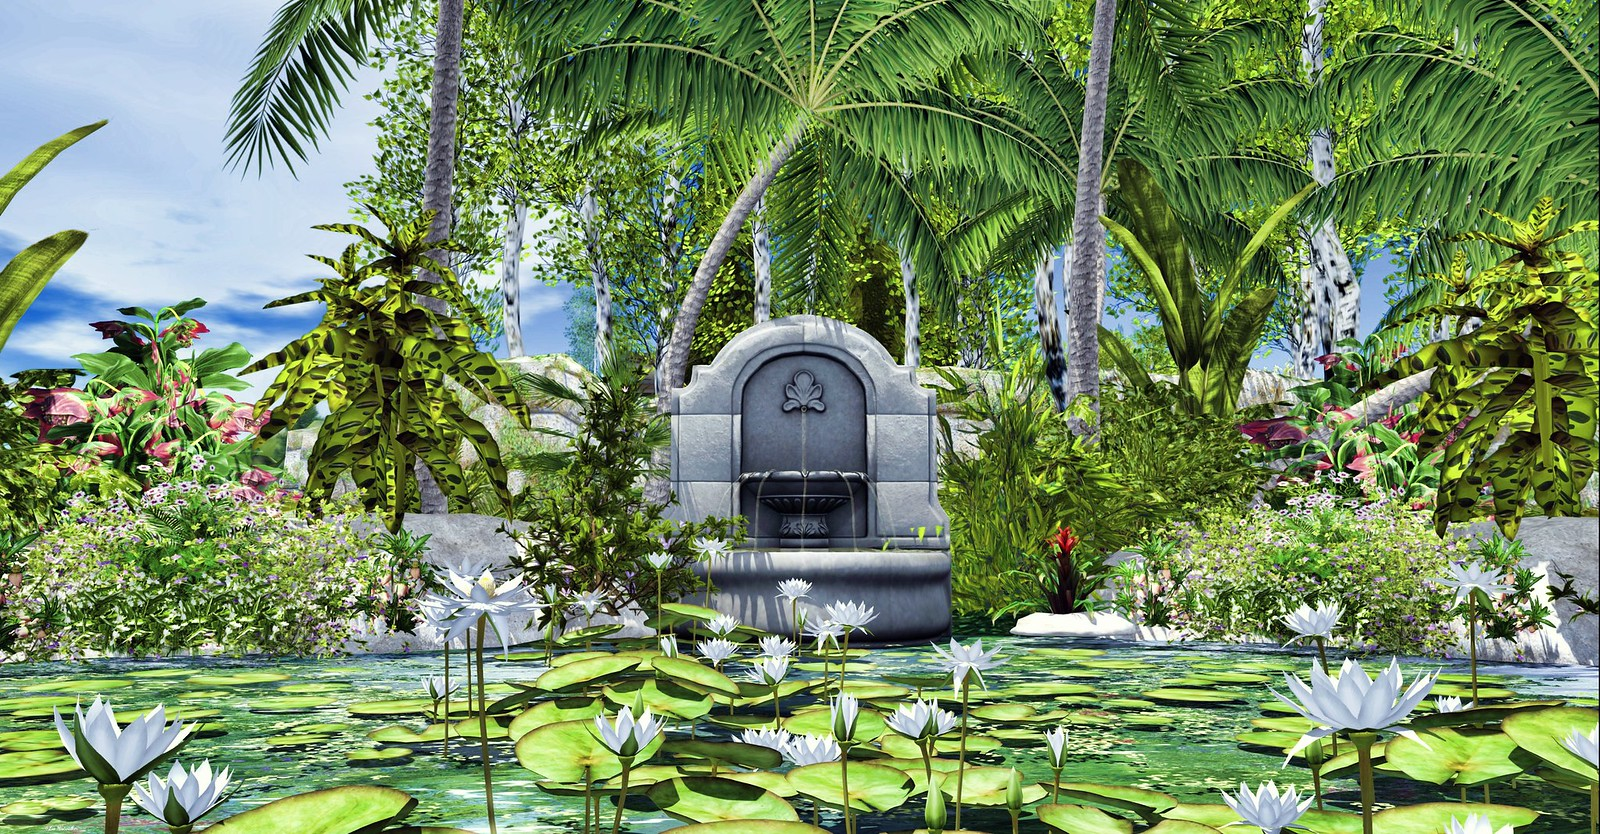 Home & Garden Therapy # 643